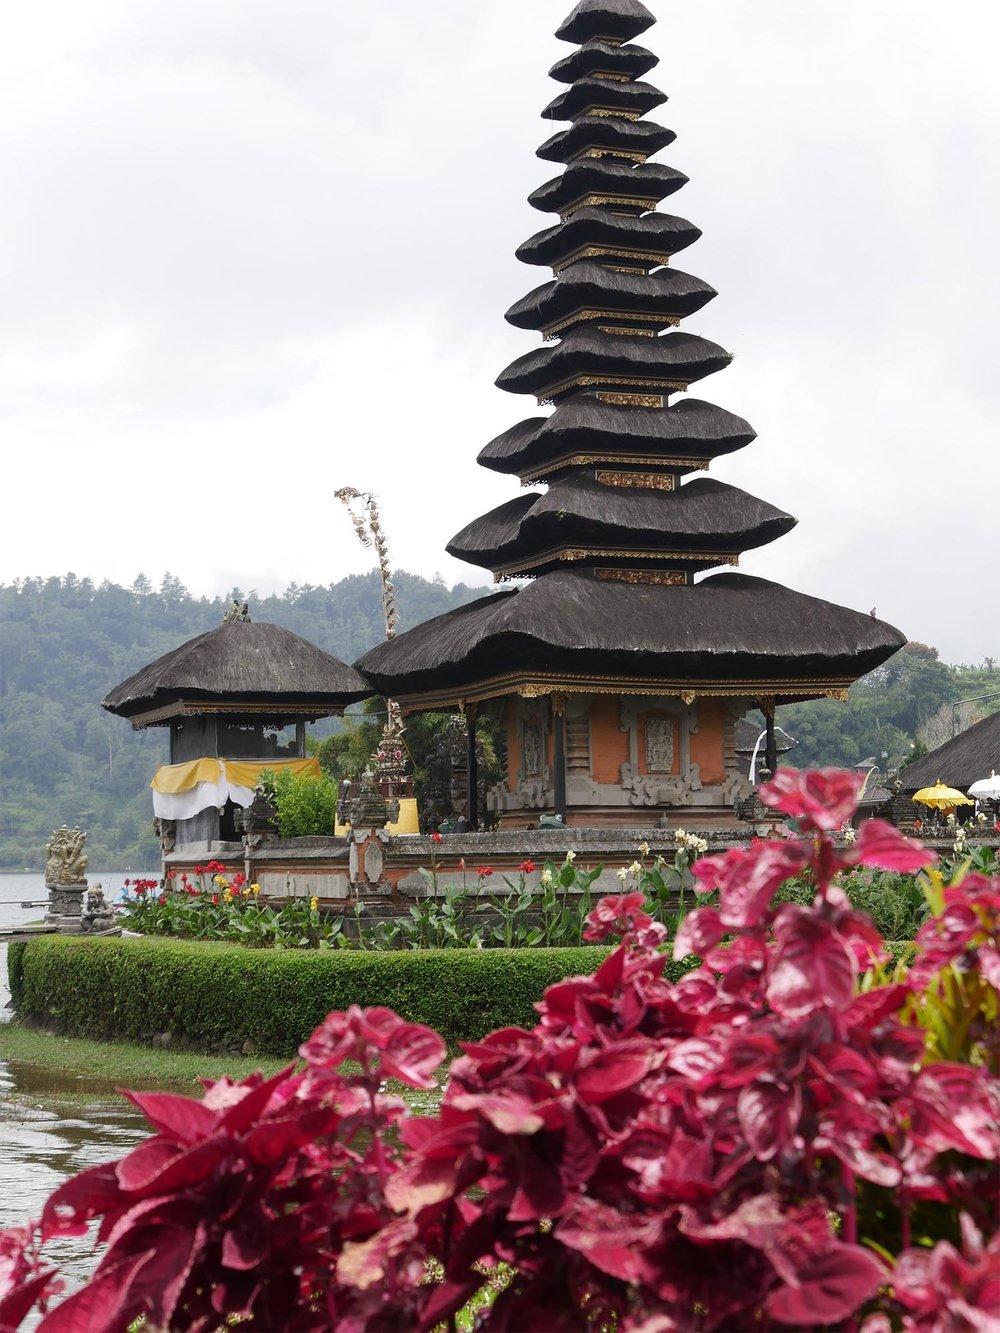 bali-indoneisia-sm.jpg